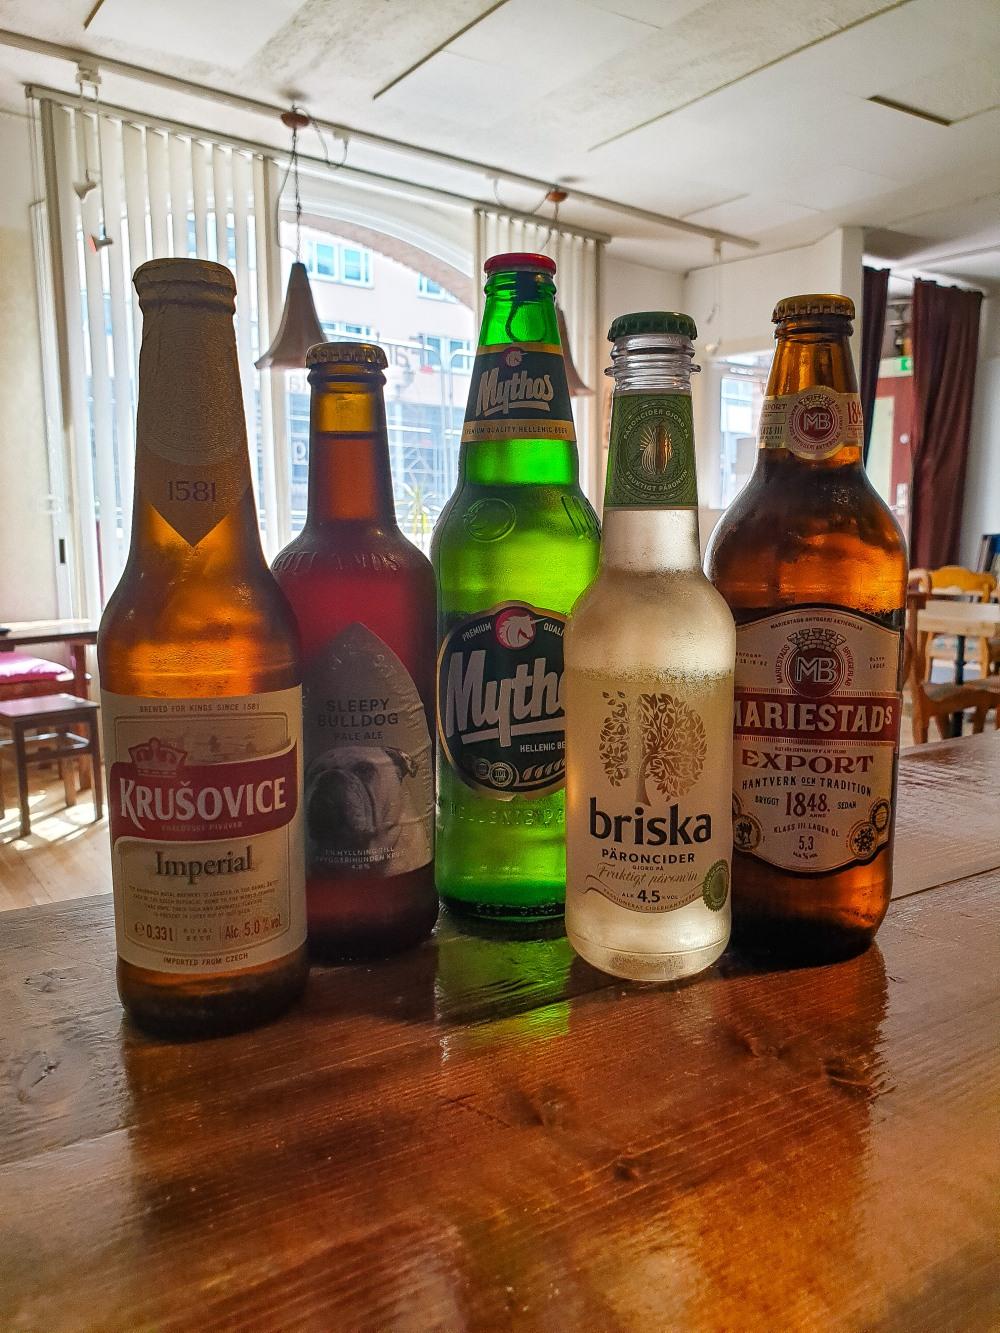 Öl, cider & ale på Farbror Nikos